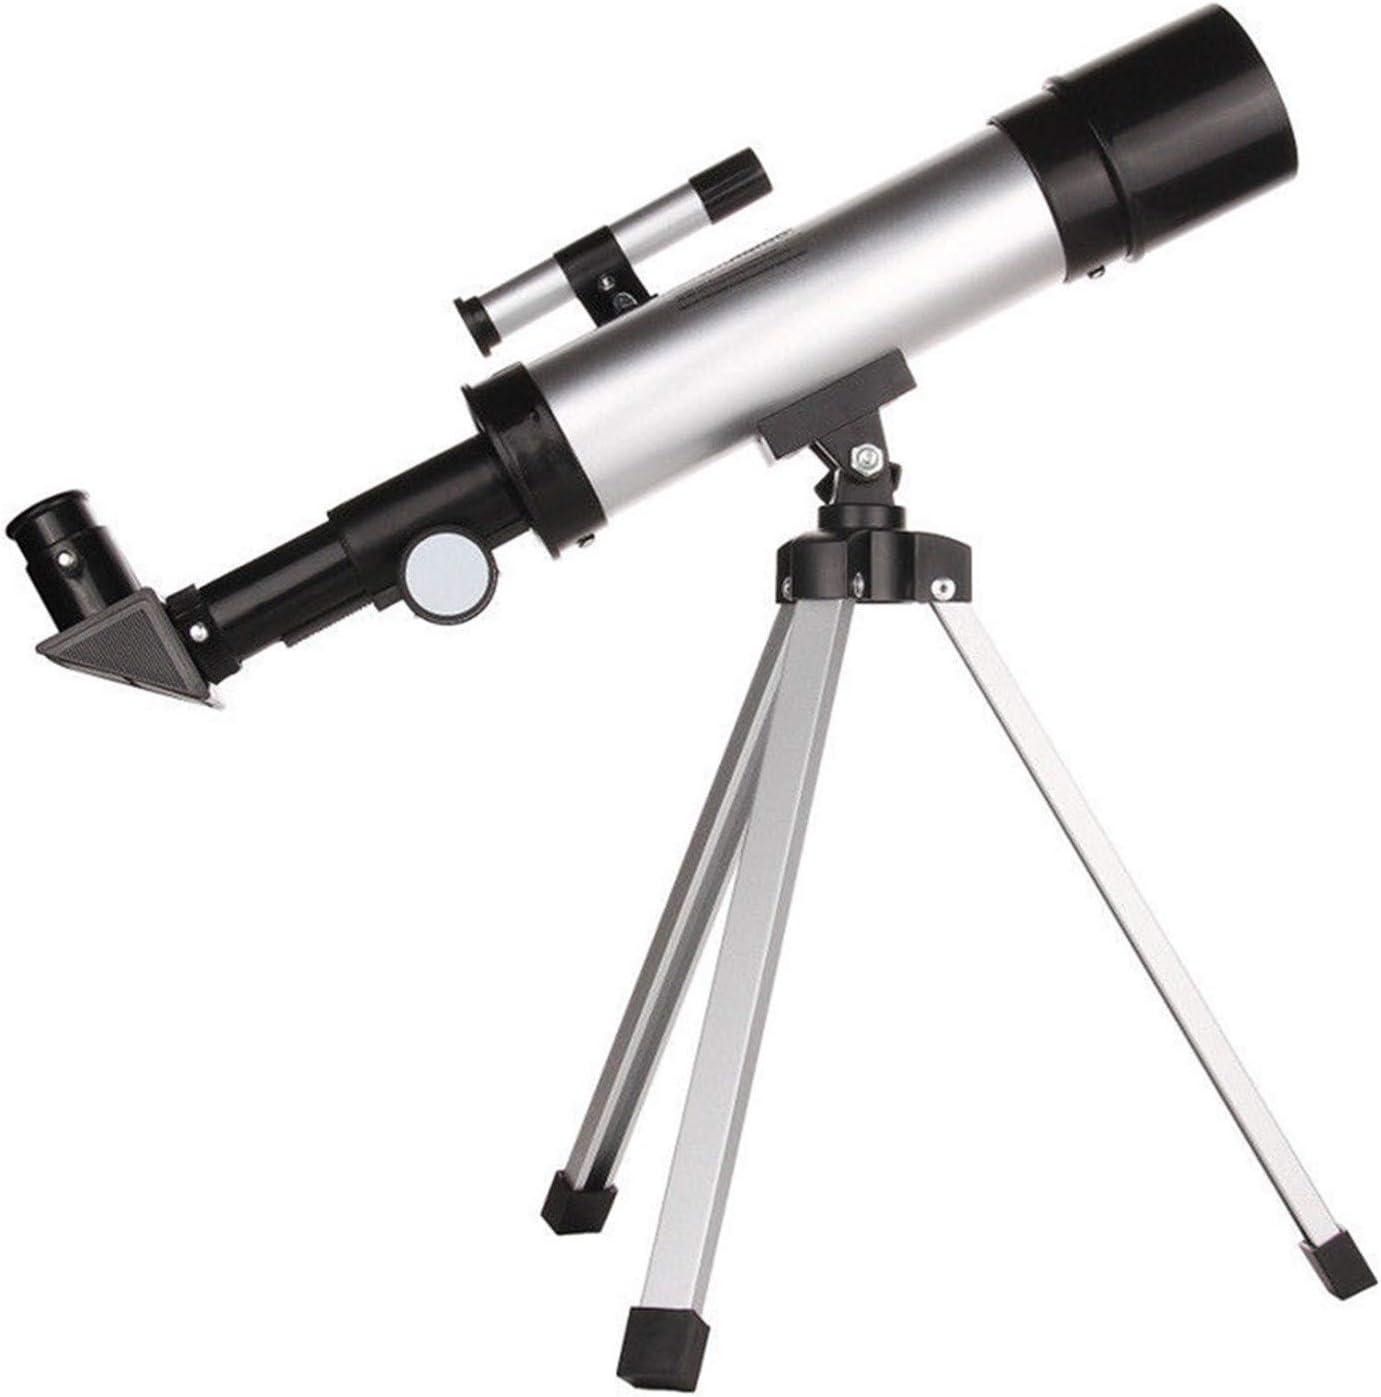 Juesi Regular dealer Astronomical Telescope for Kids 25% OFF Travel Lunar